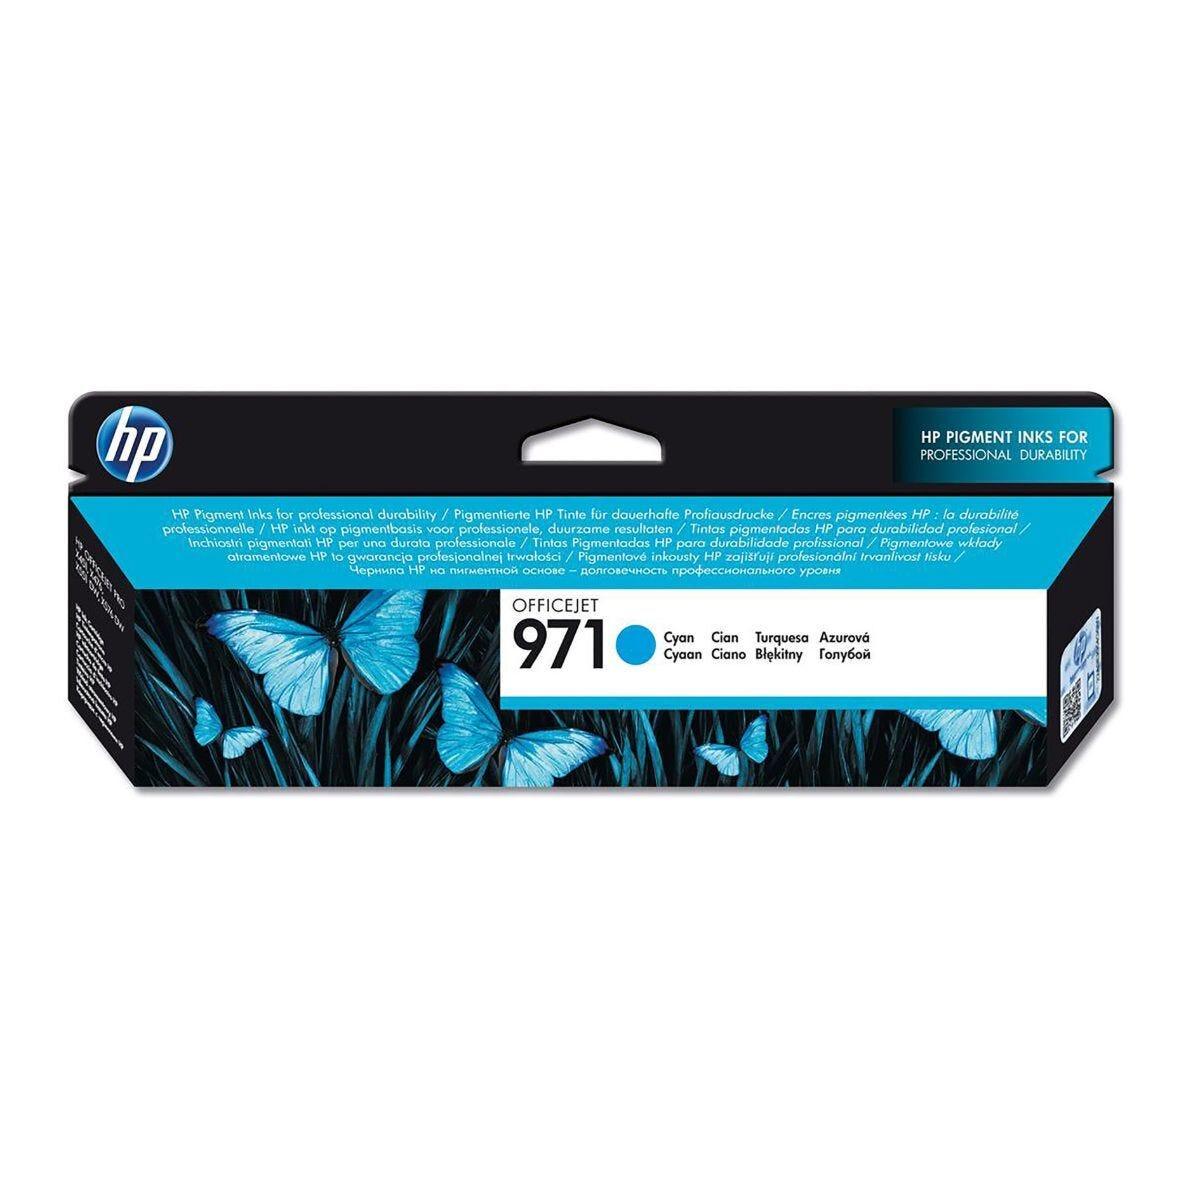 HP 971 Officejet Ink Cartridge HP CN623AE Cyan